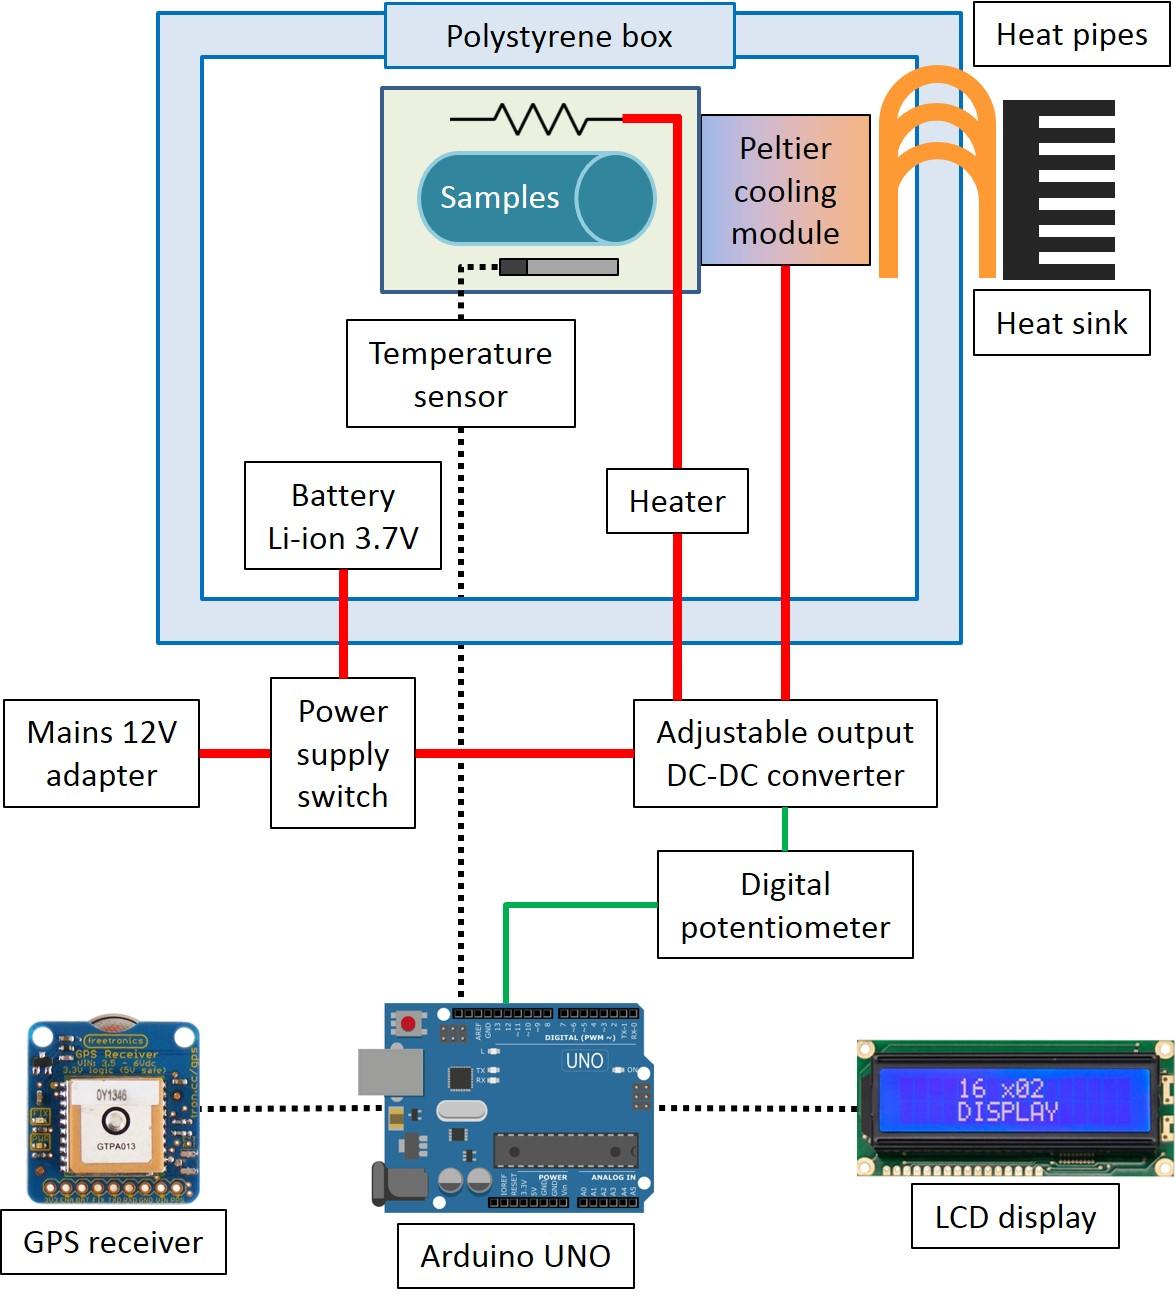 Circuitdiagram ngvanlqhhc